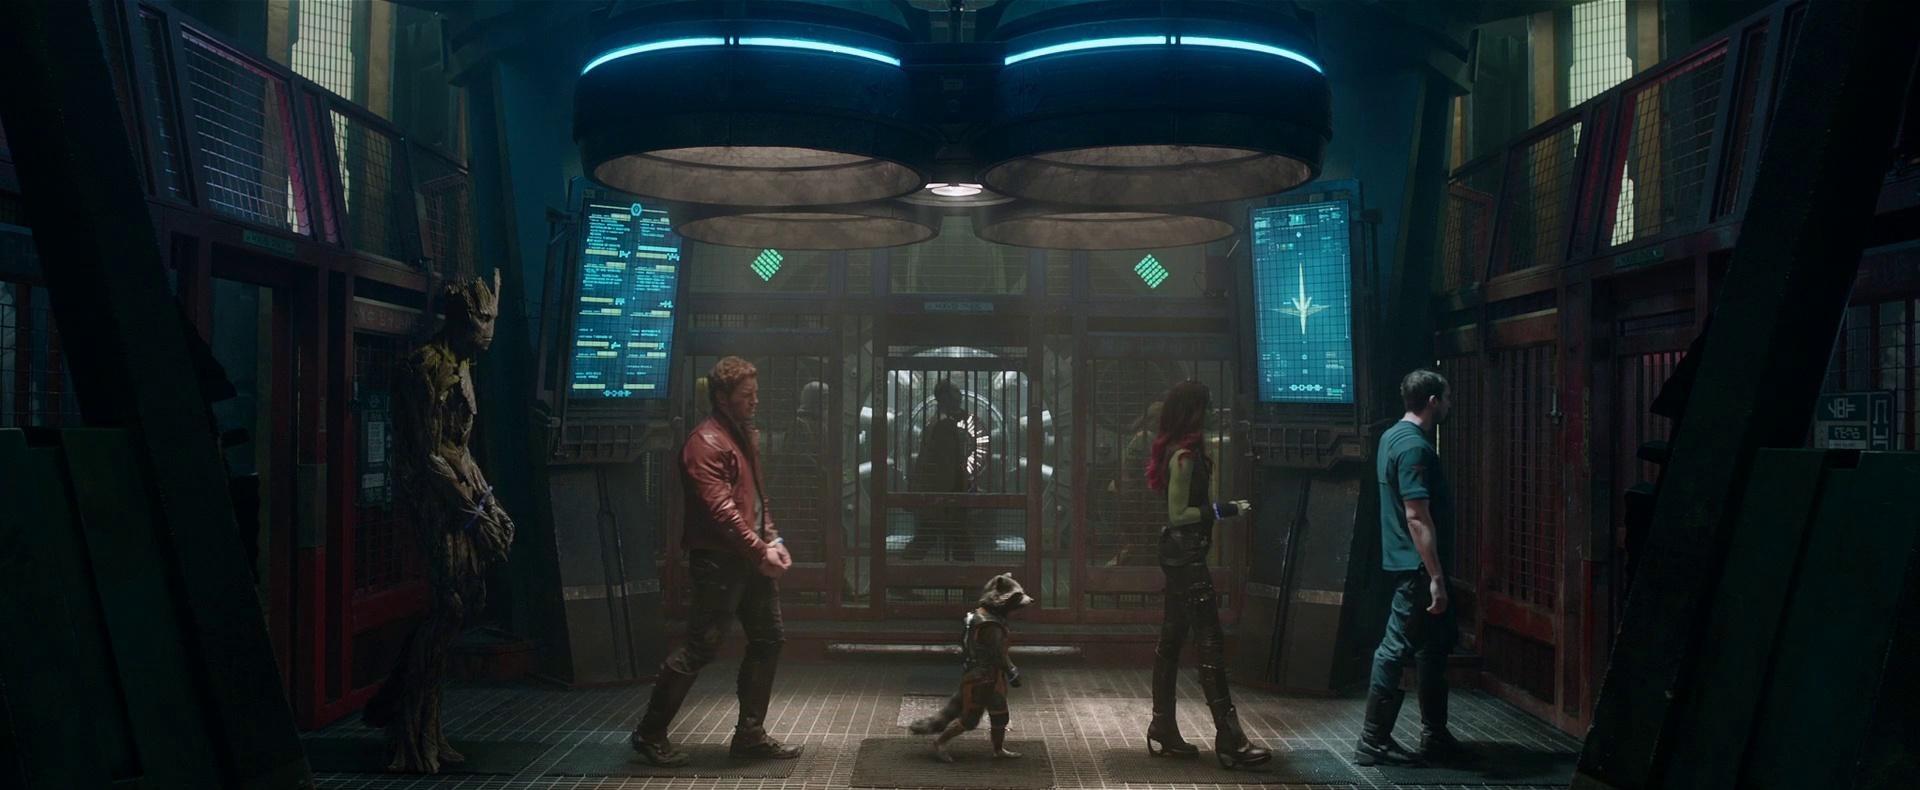 Galerie Les Gardiens de la Galaxie 6